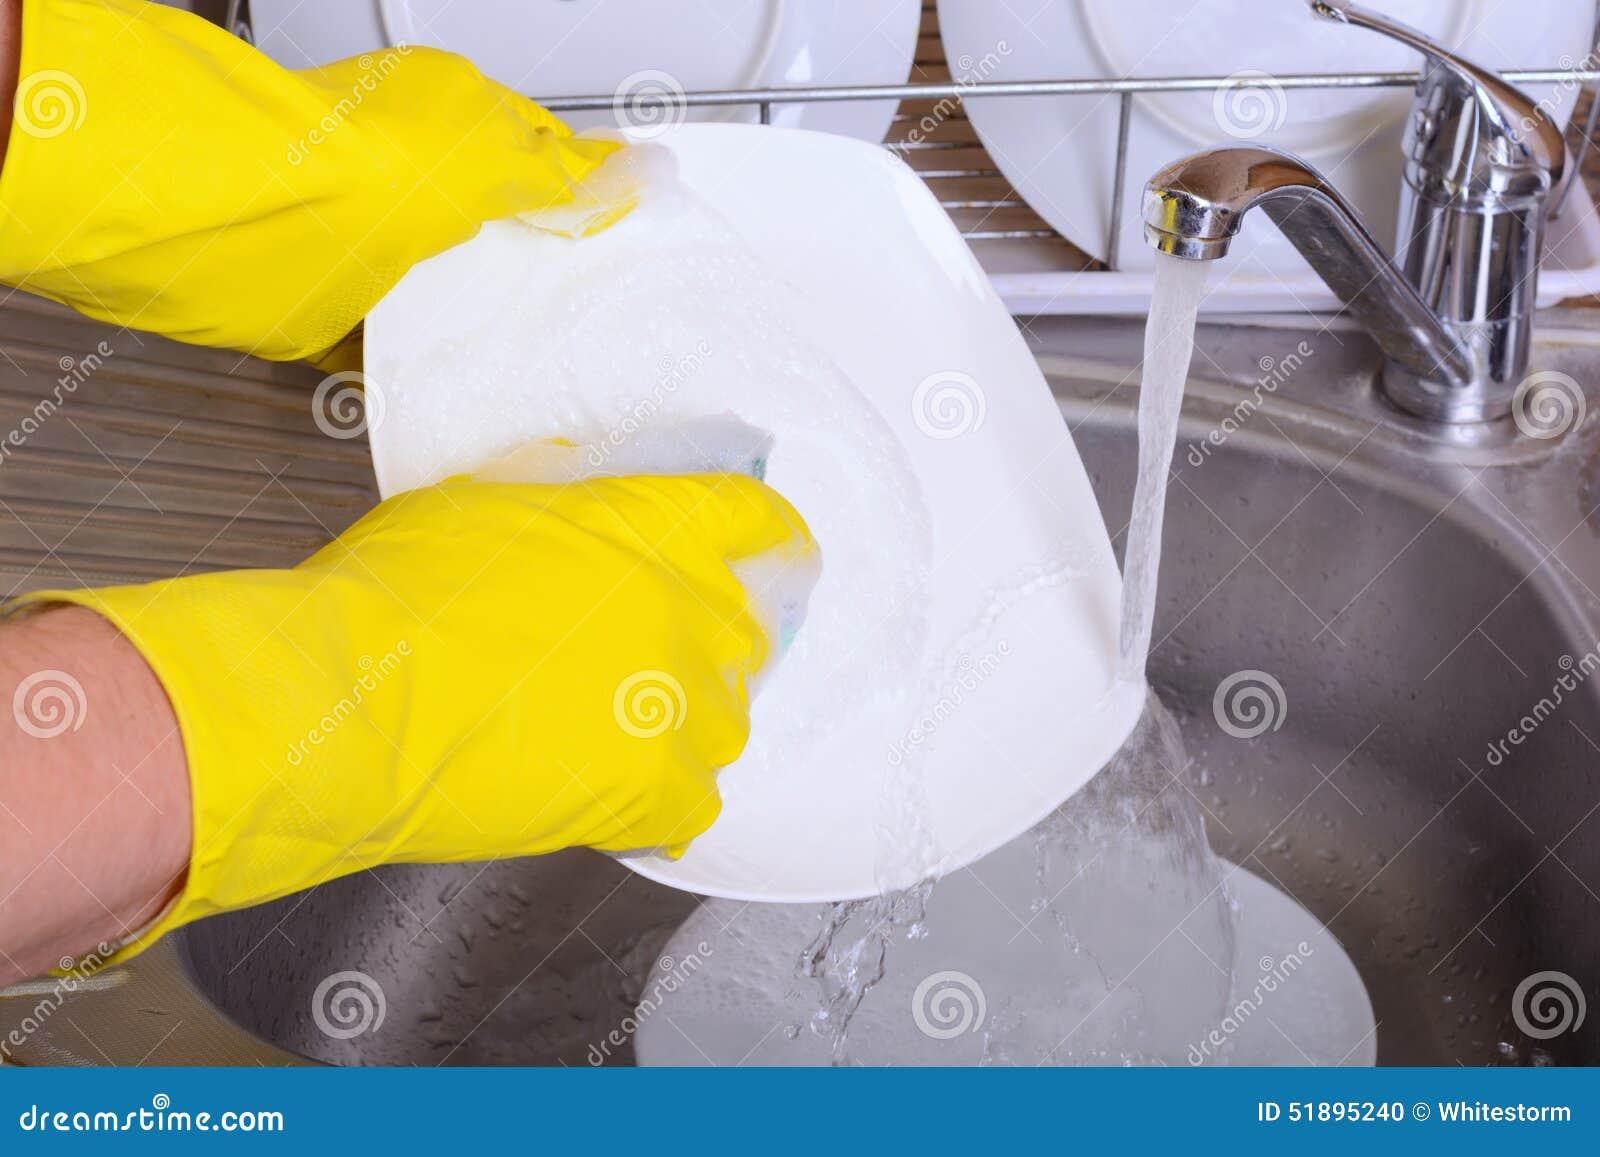 Washing Dish Stock Photo